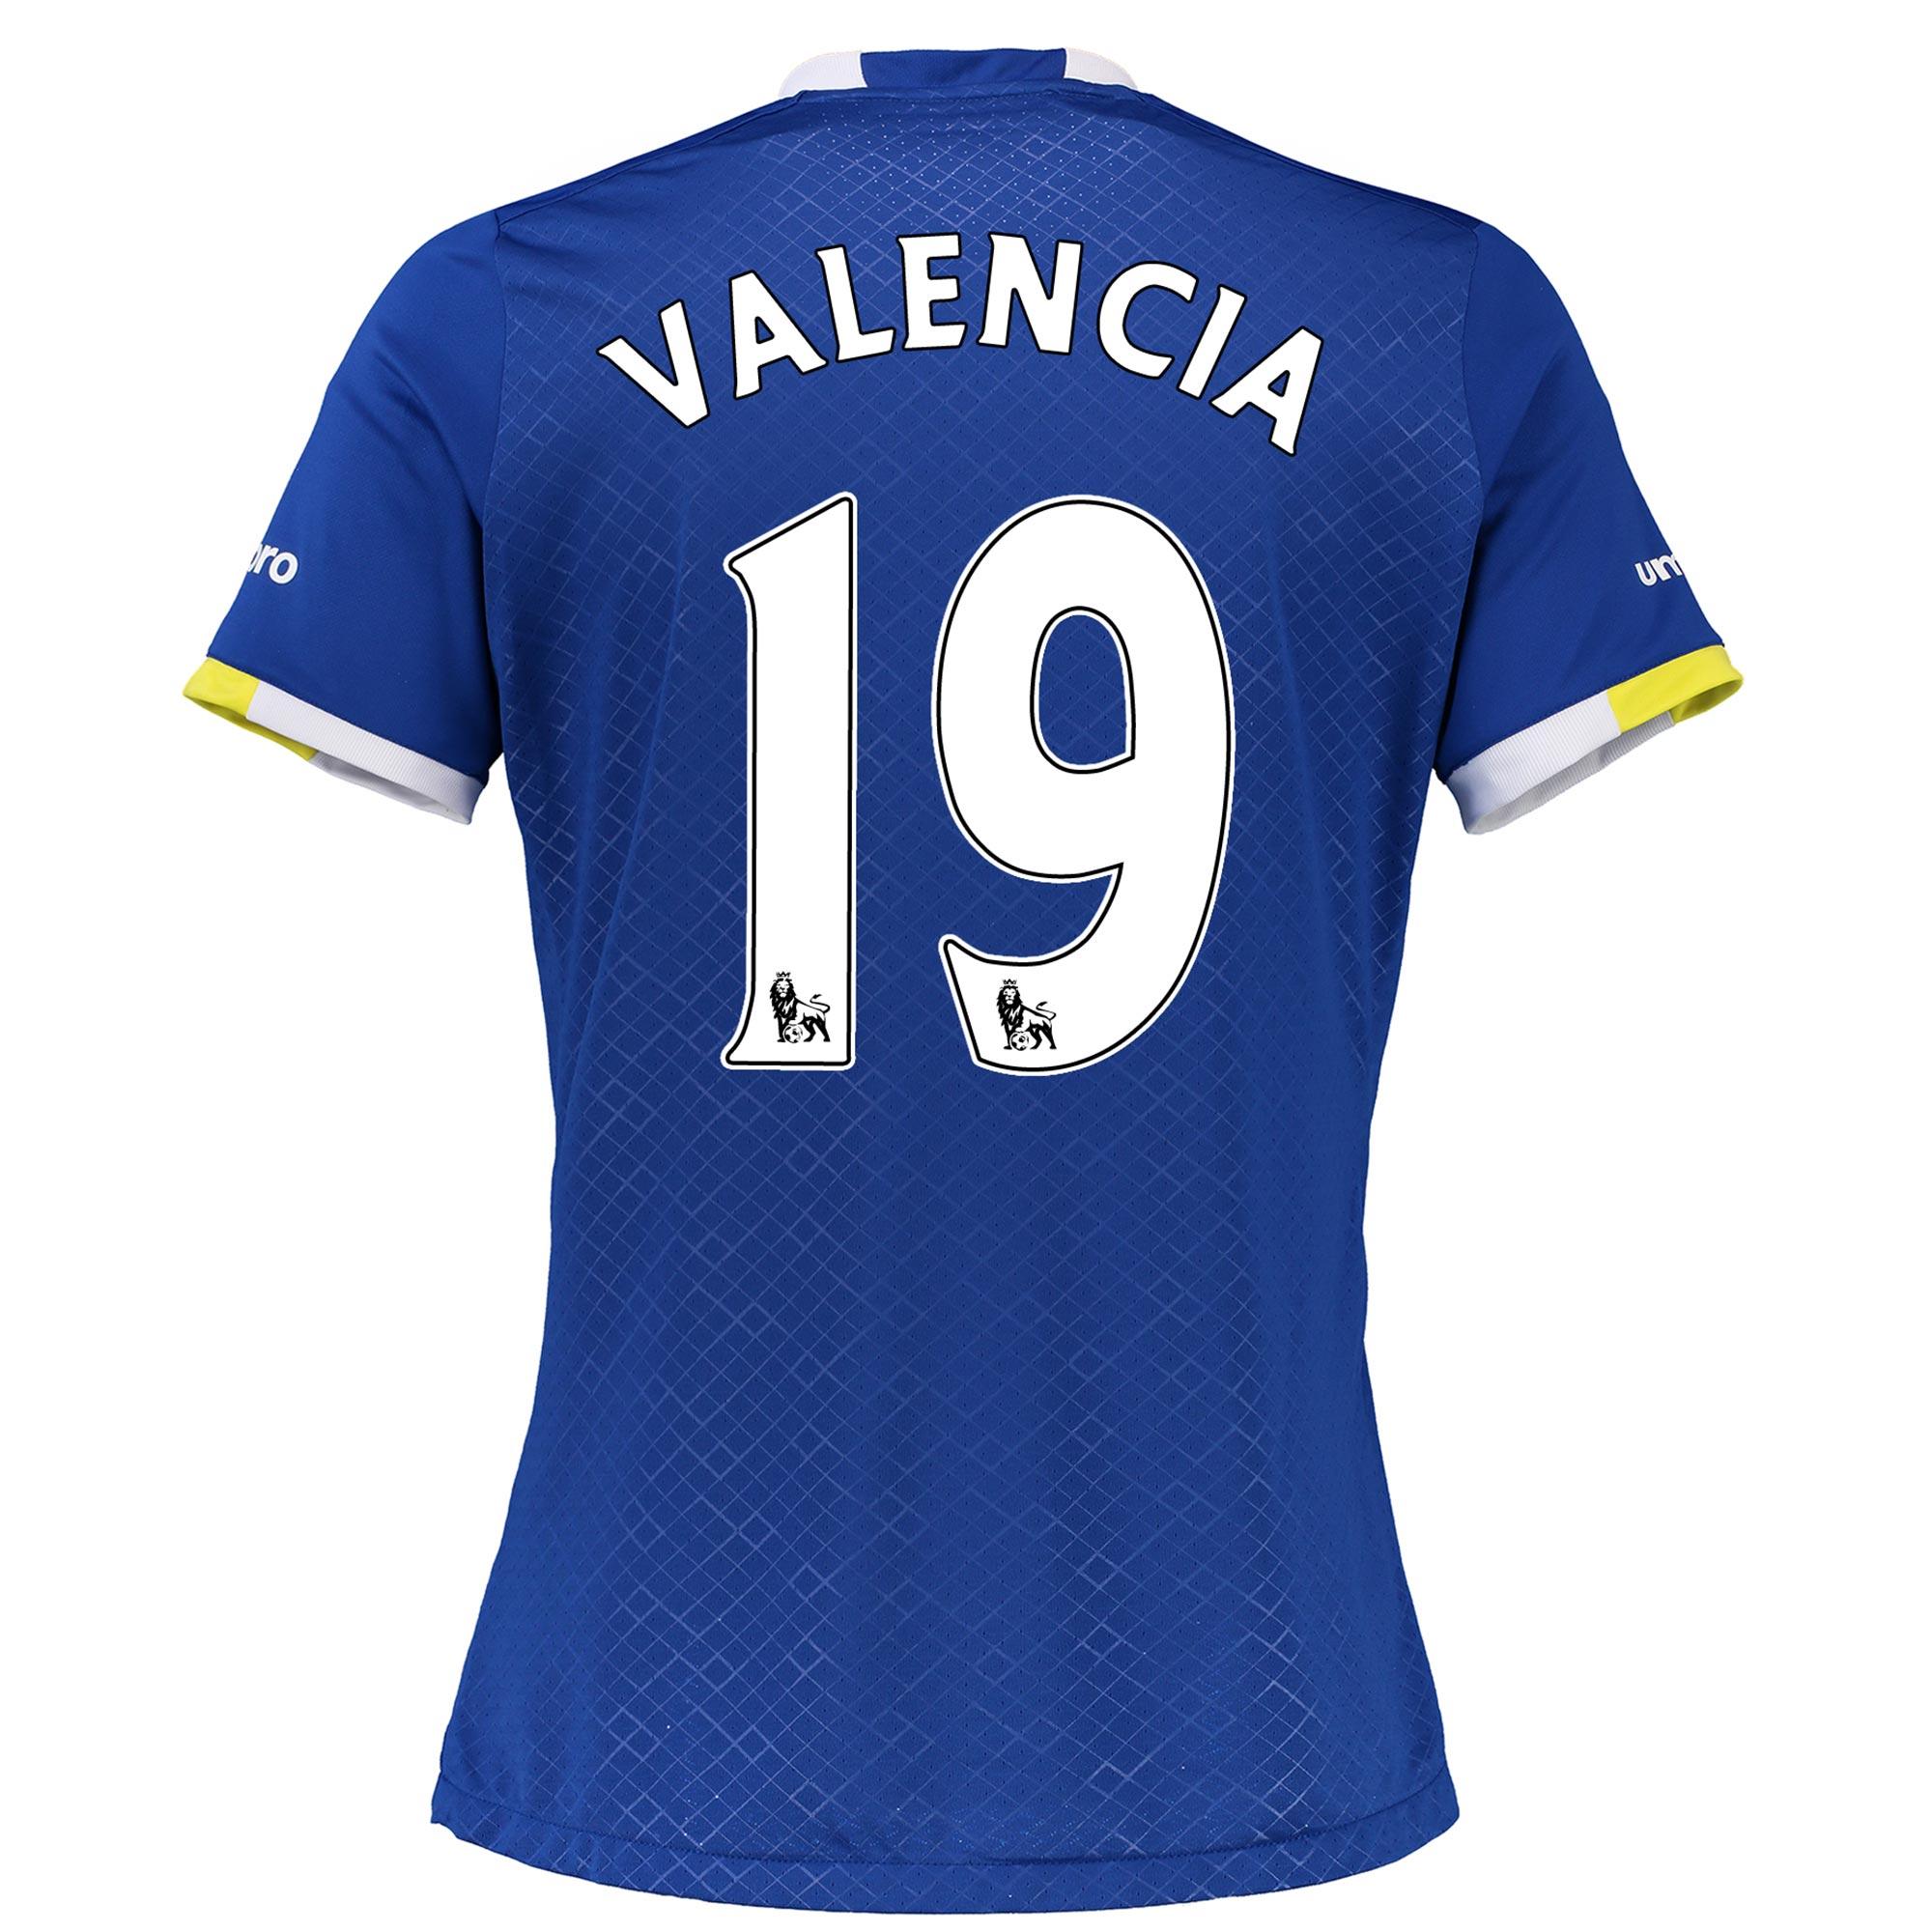 Everton Home Shirt 2016/17 - Womens with Valencia 19 printing